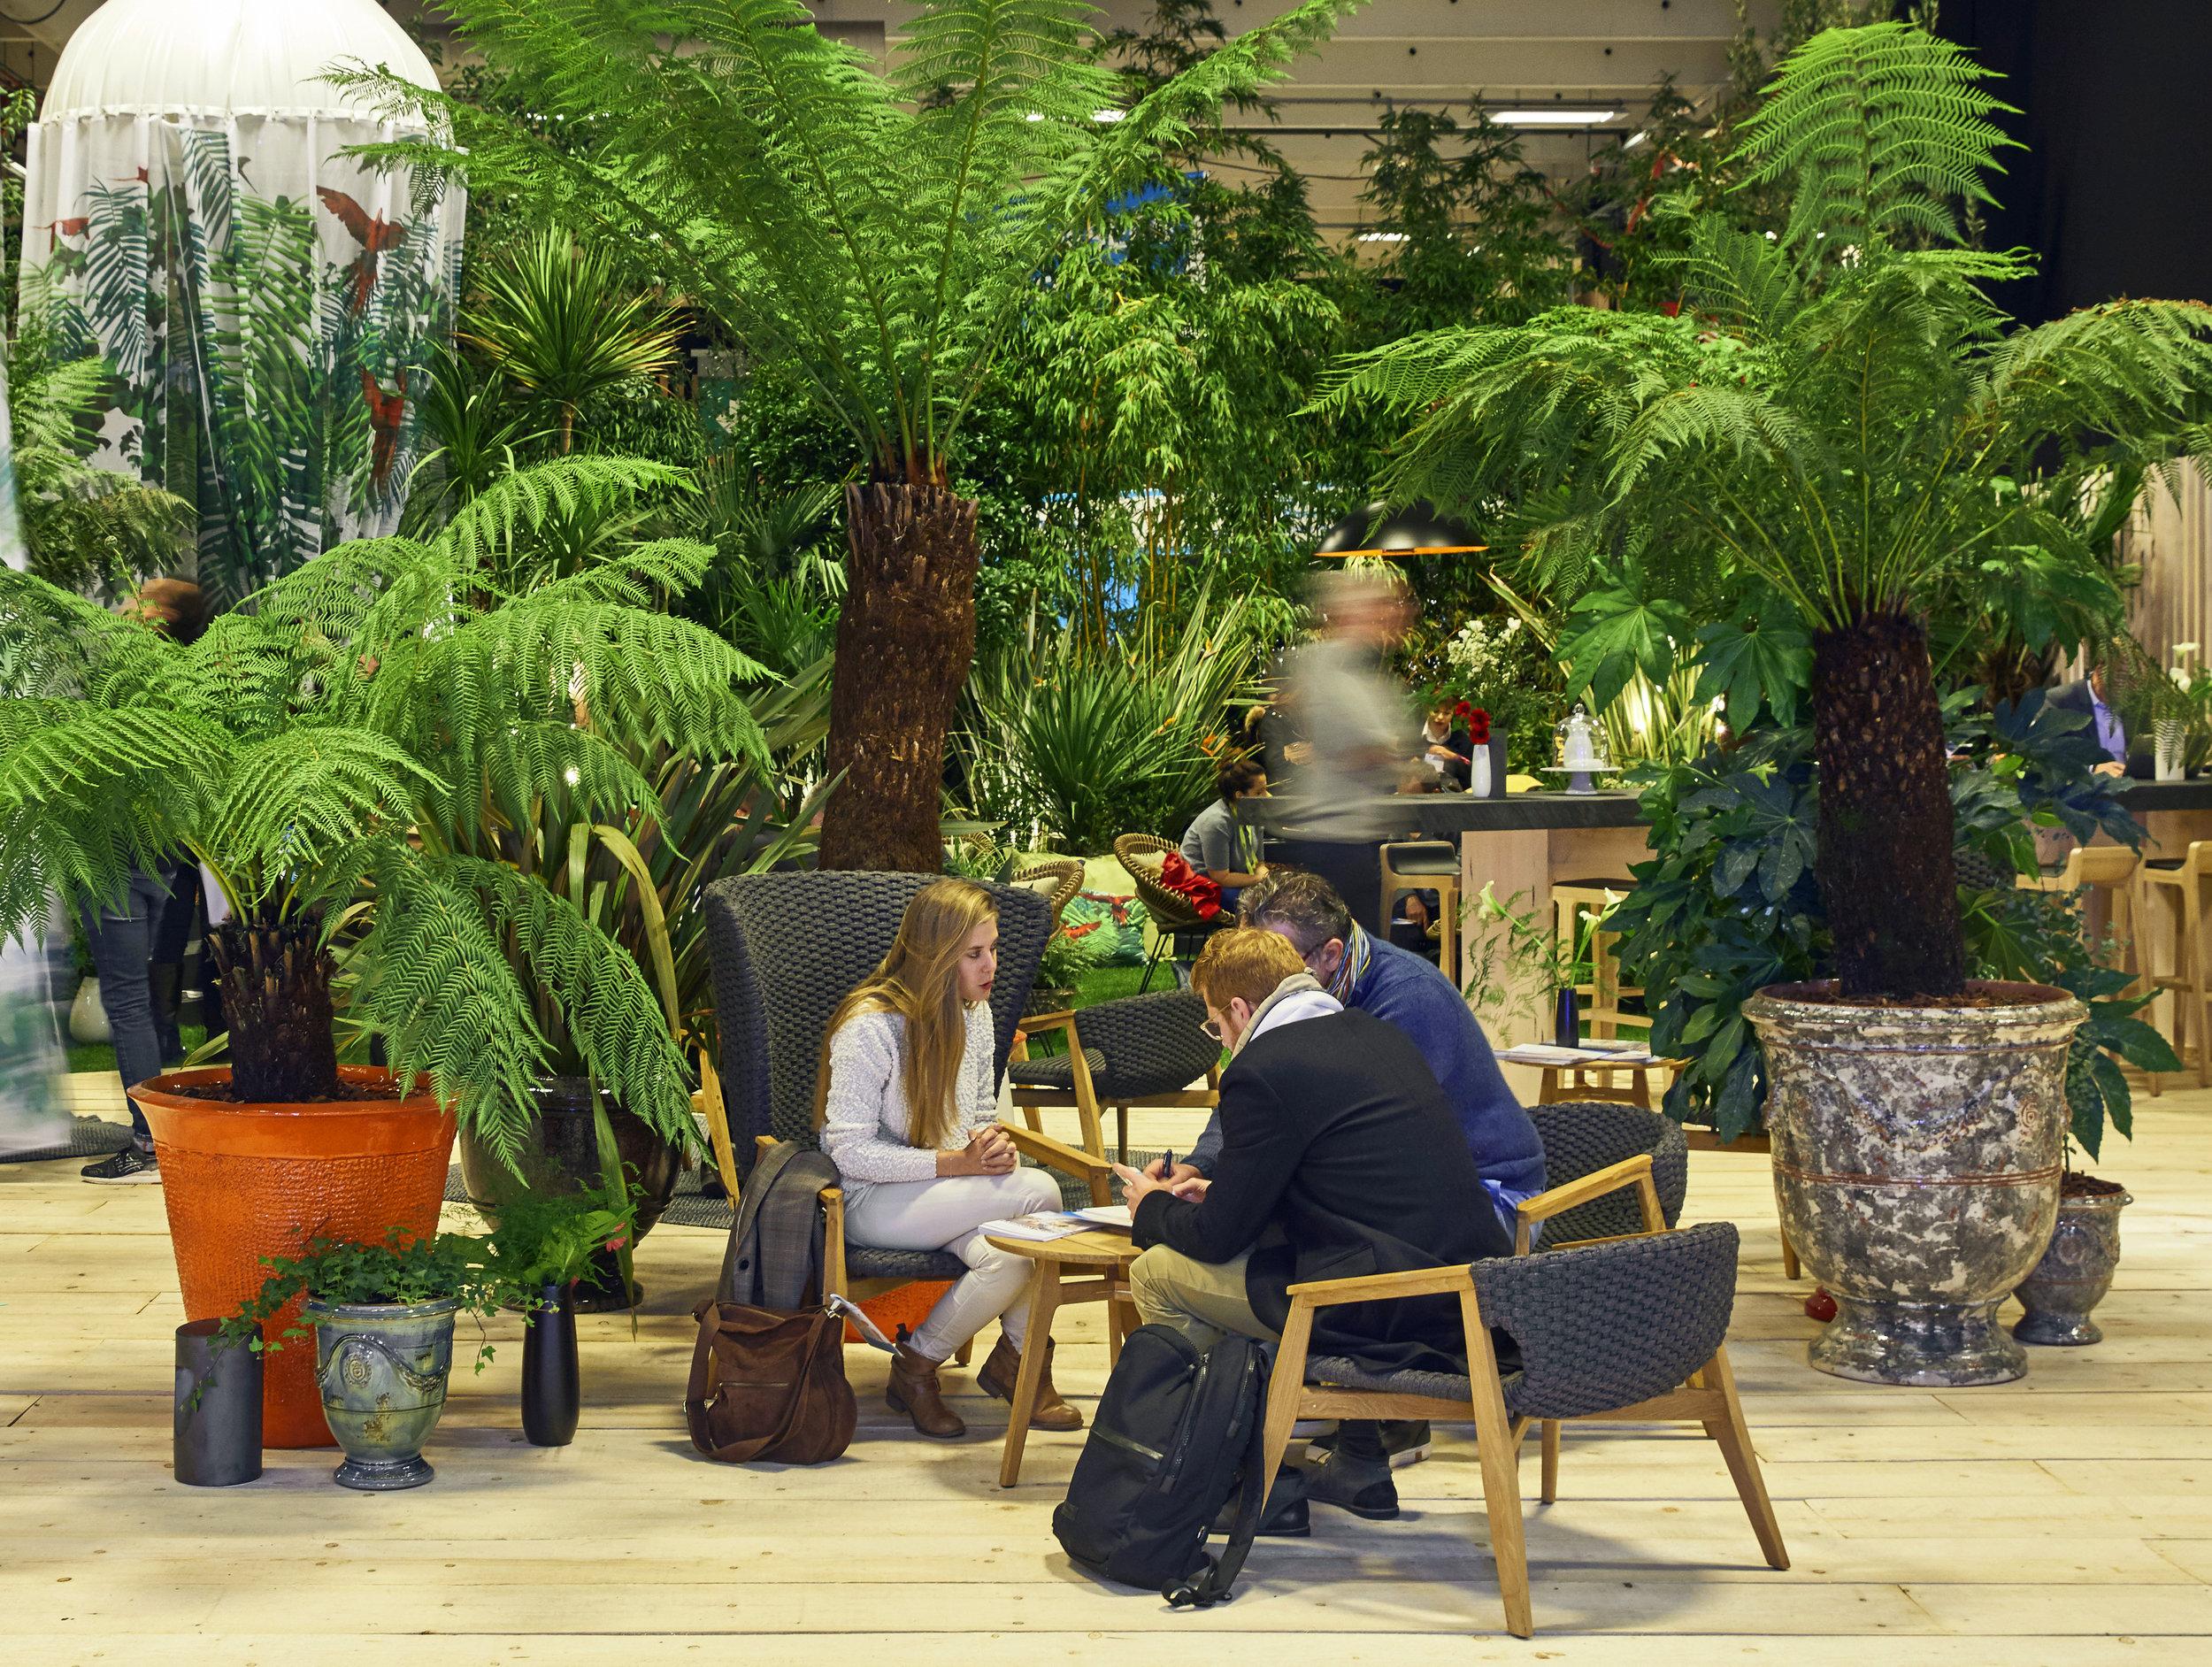 salon_equiphotel_paris_terrasses_jardins_outdoor_garden_christophe_gautrand_paysagiste_5.jpg